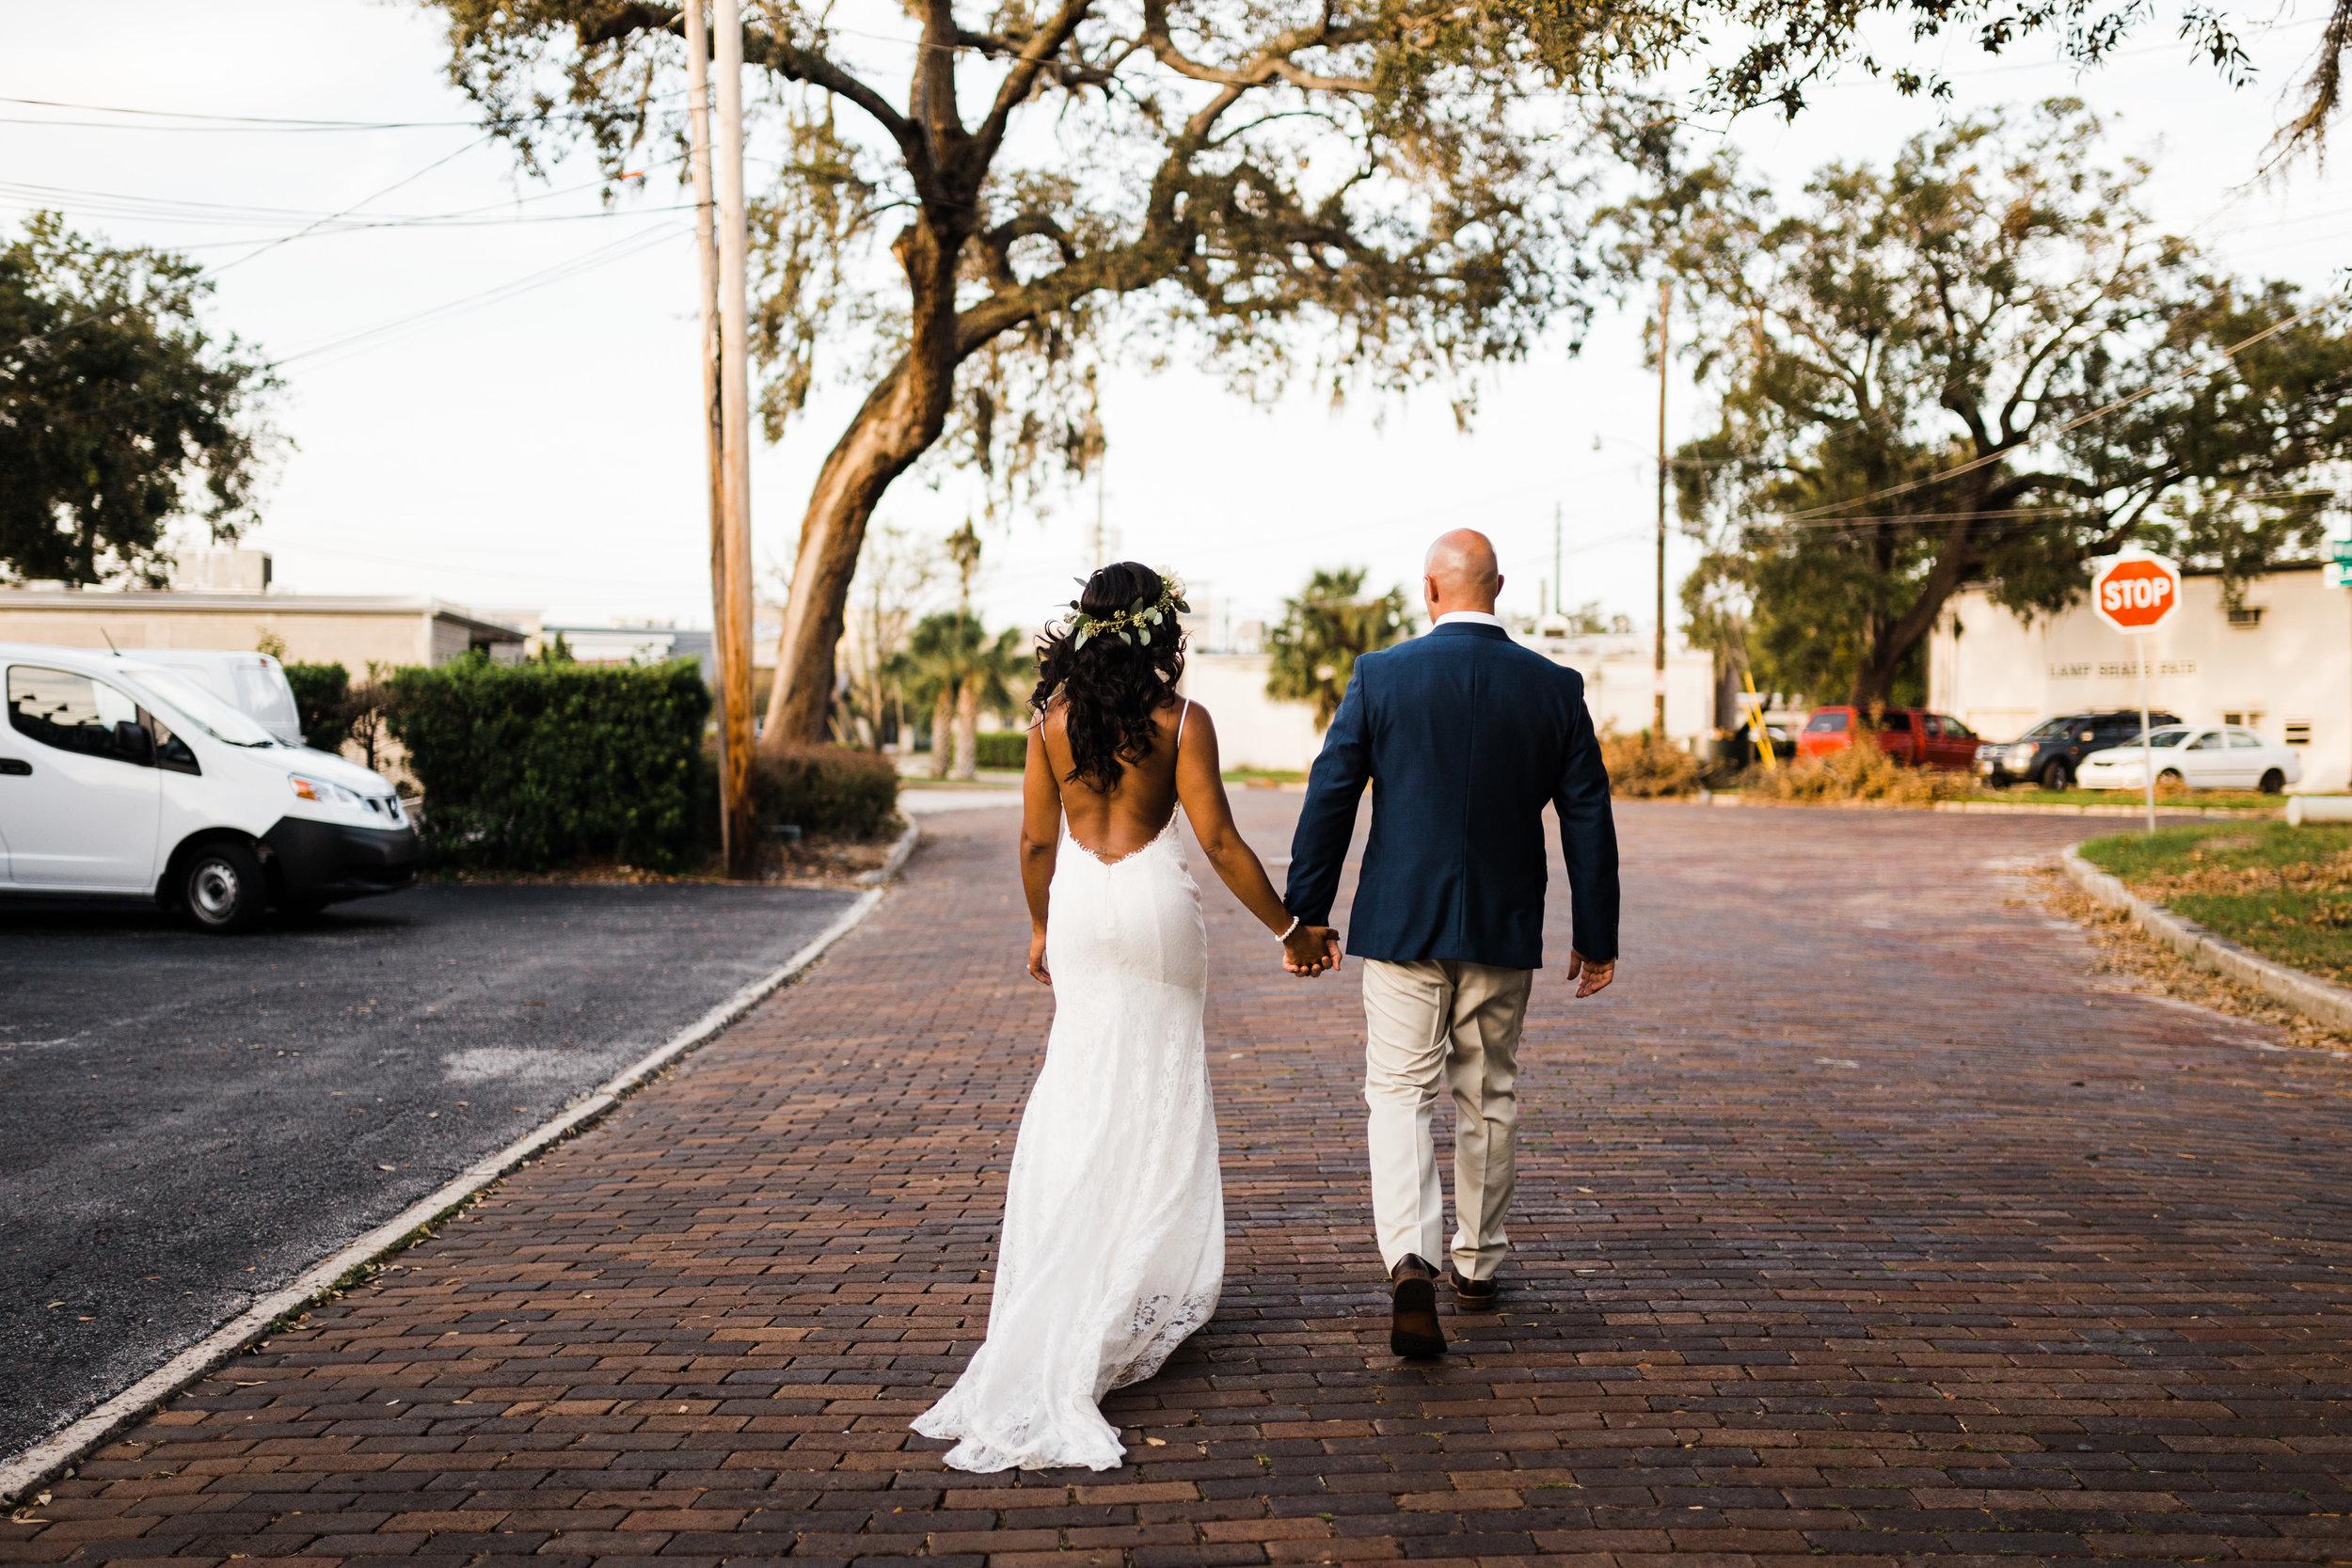 2017.09.16 Ashley and Chuck O'Day Quantam Leap Winery Wedding (387 of 462).jpg